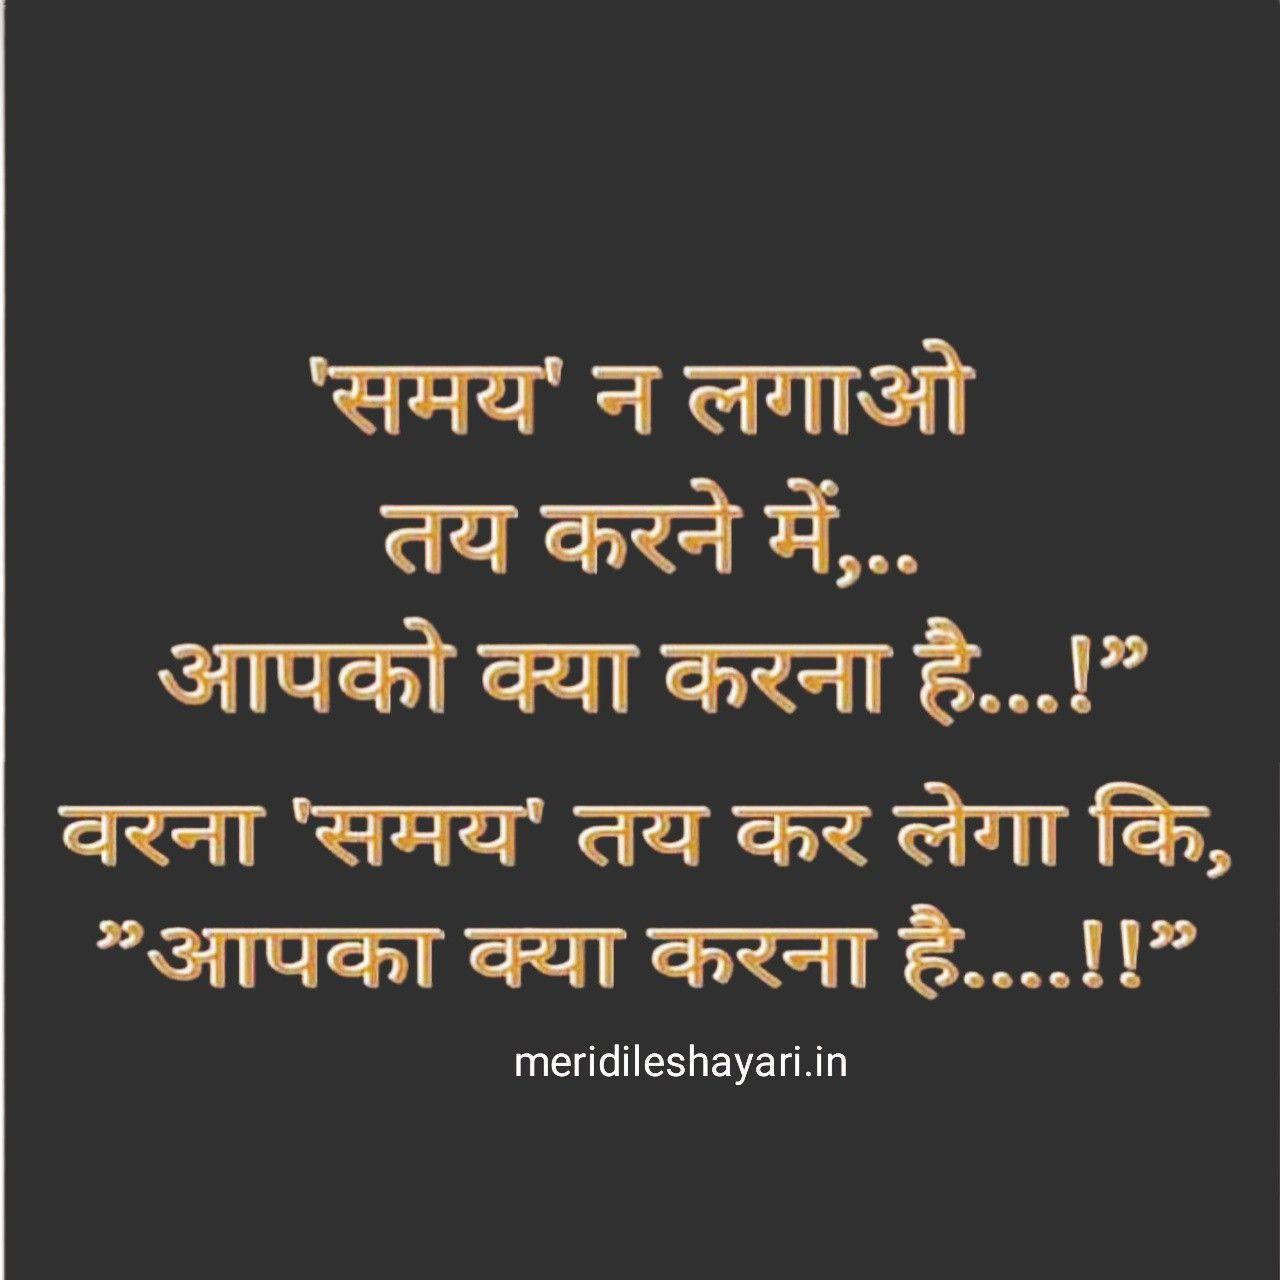 Hindi Shayari Collection Motivational Picture Quotes